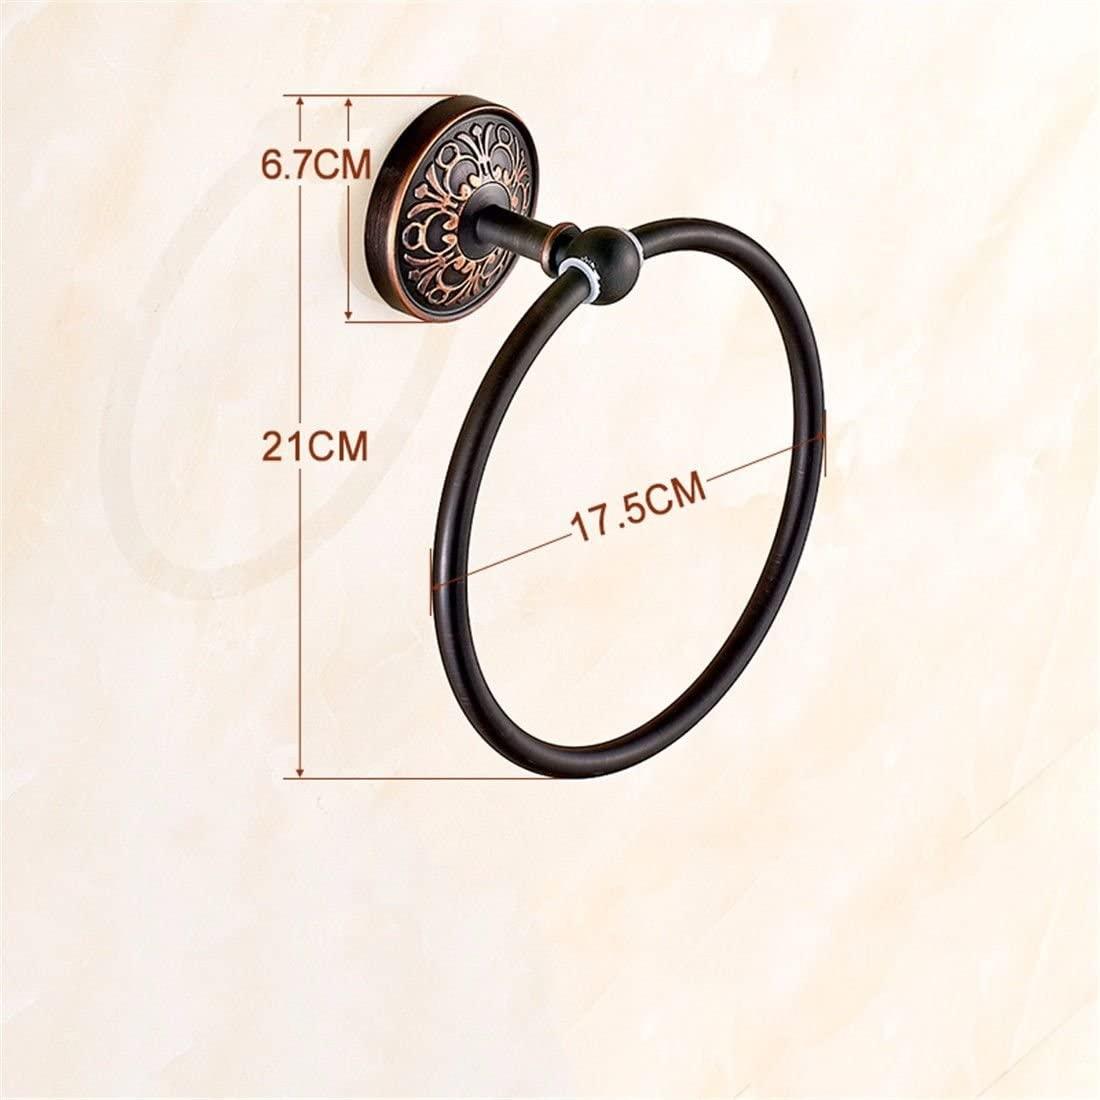 AiRobin-Brass Black Antique Wall Mounted Towel Ring Bathroom Accessory